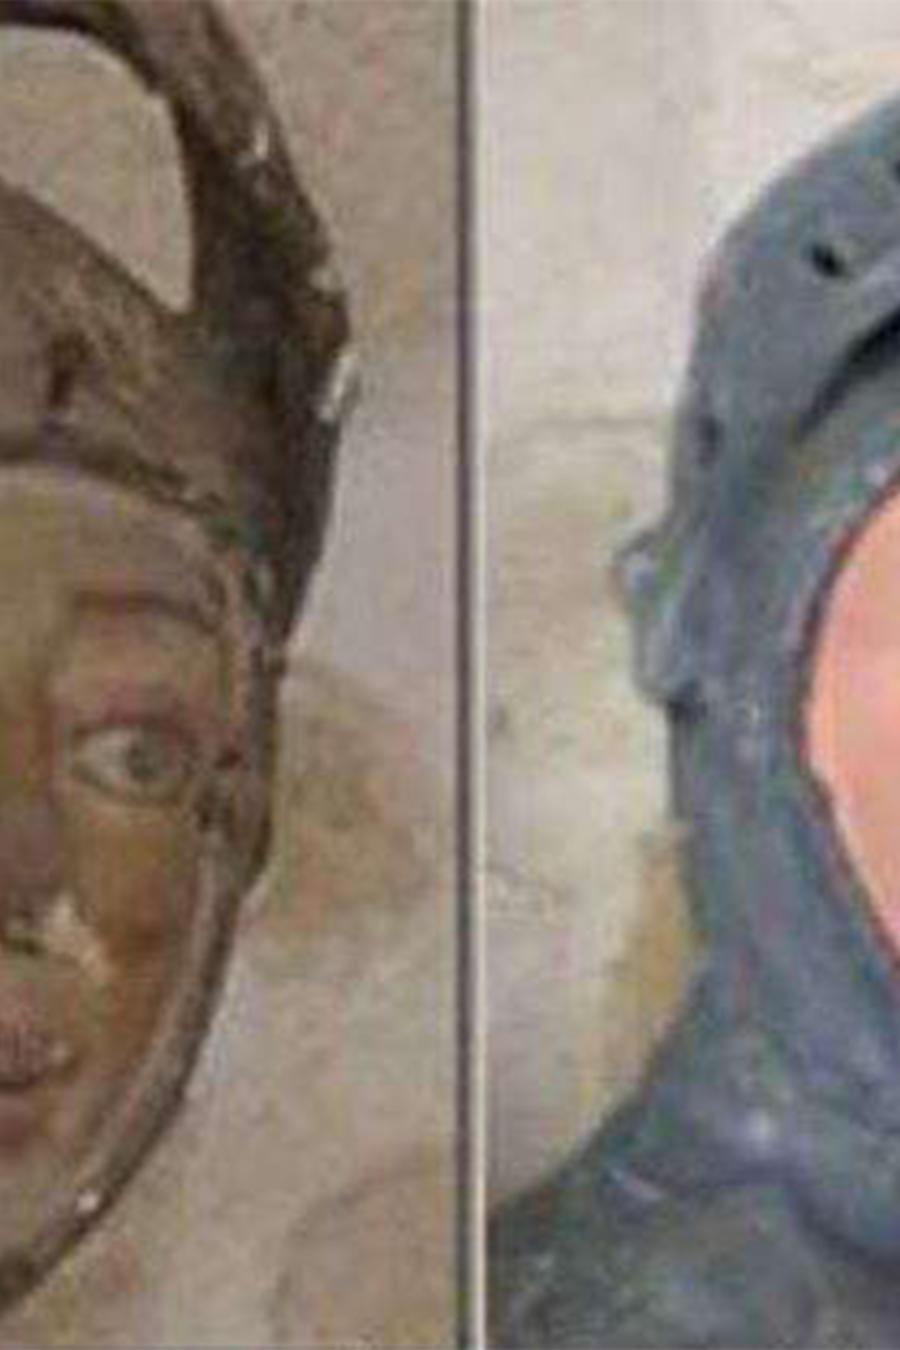 Restauración de escultura no queda como se esperaba